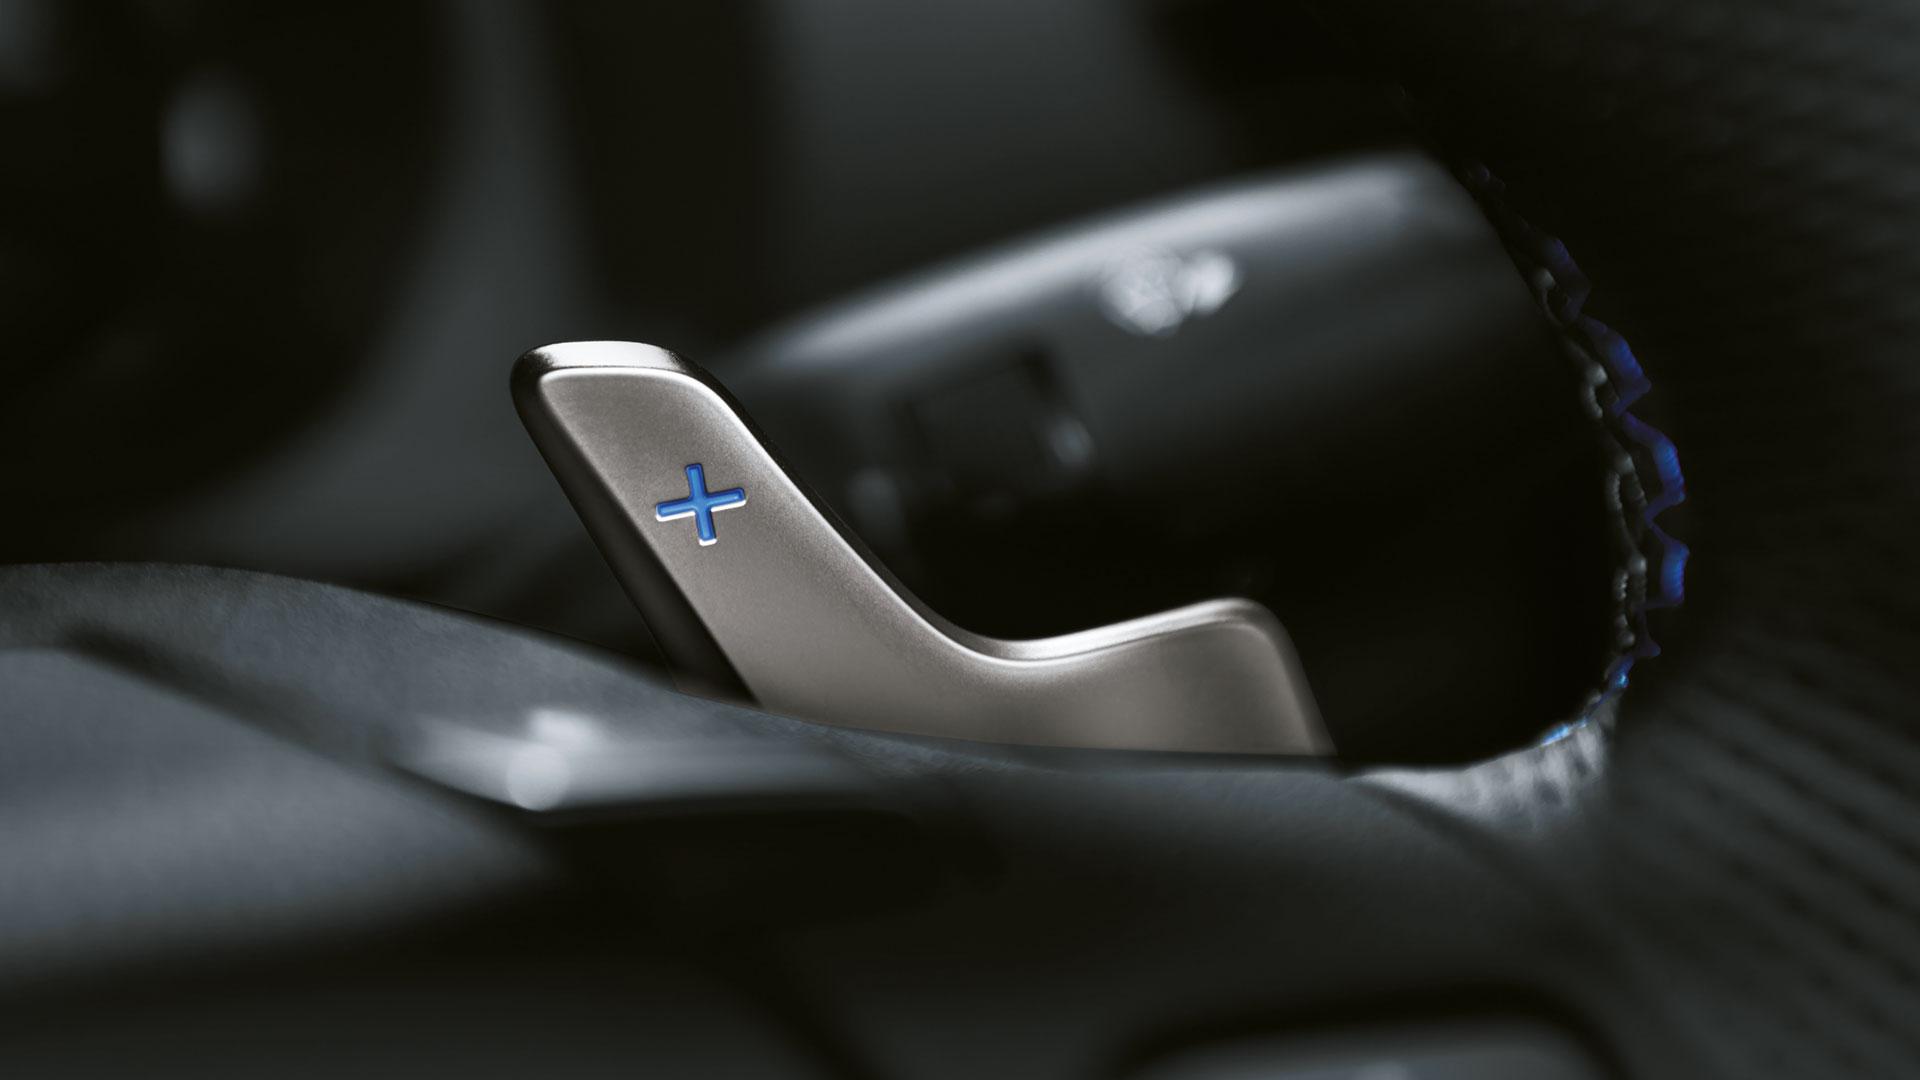 2018 lexus rc f 8 speed transmission features